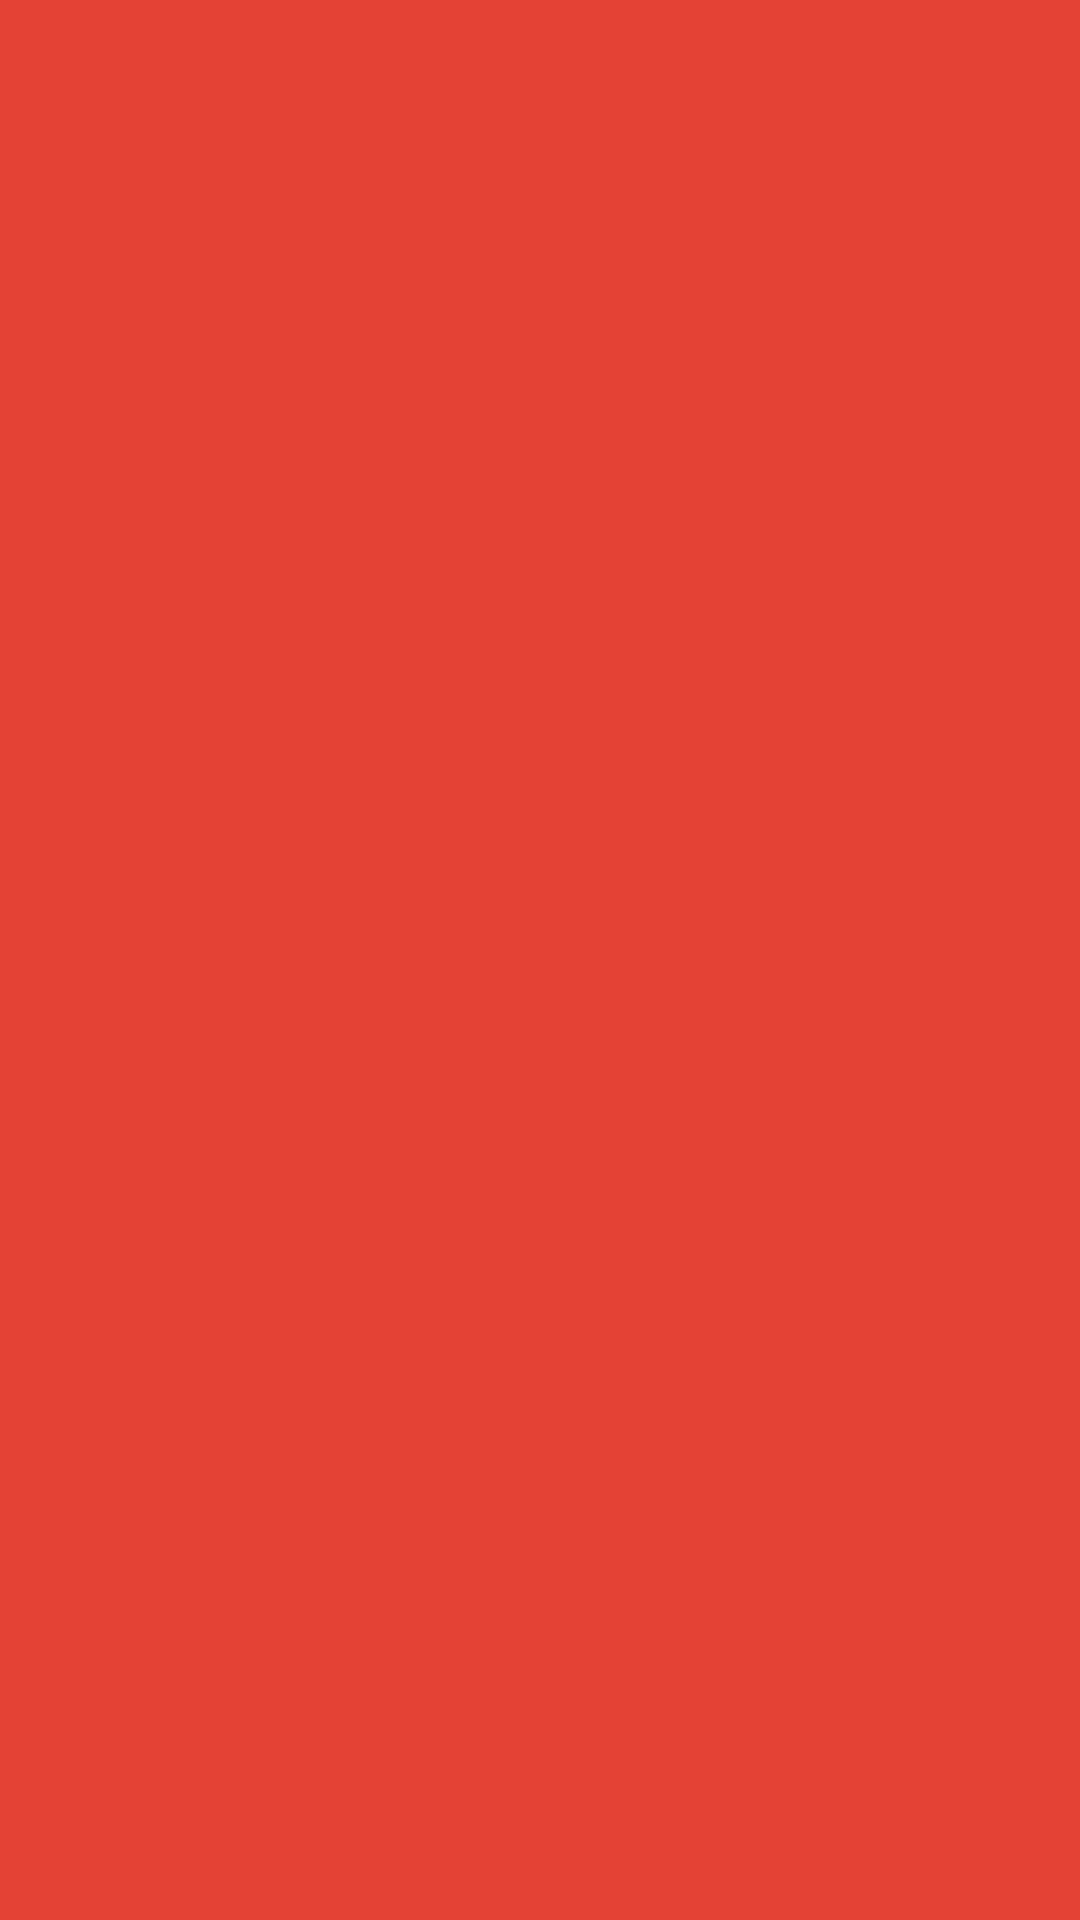 1080x1920 Vermilion Cinnabar Solid Color Background